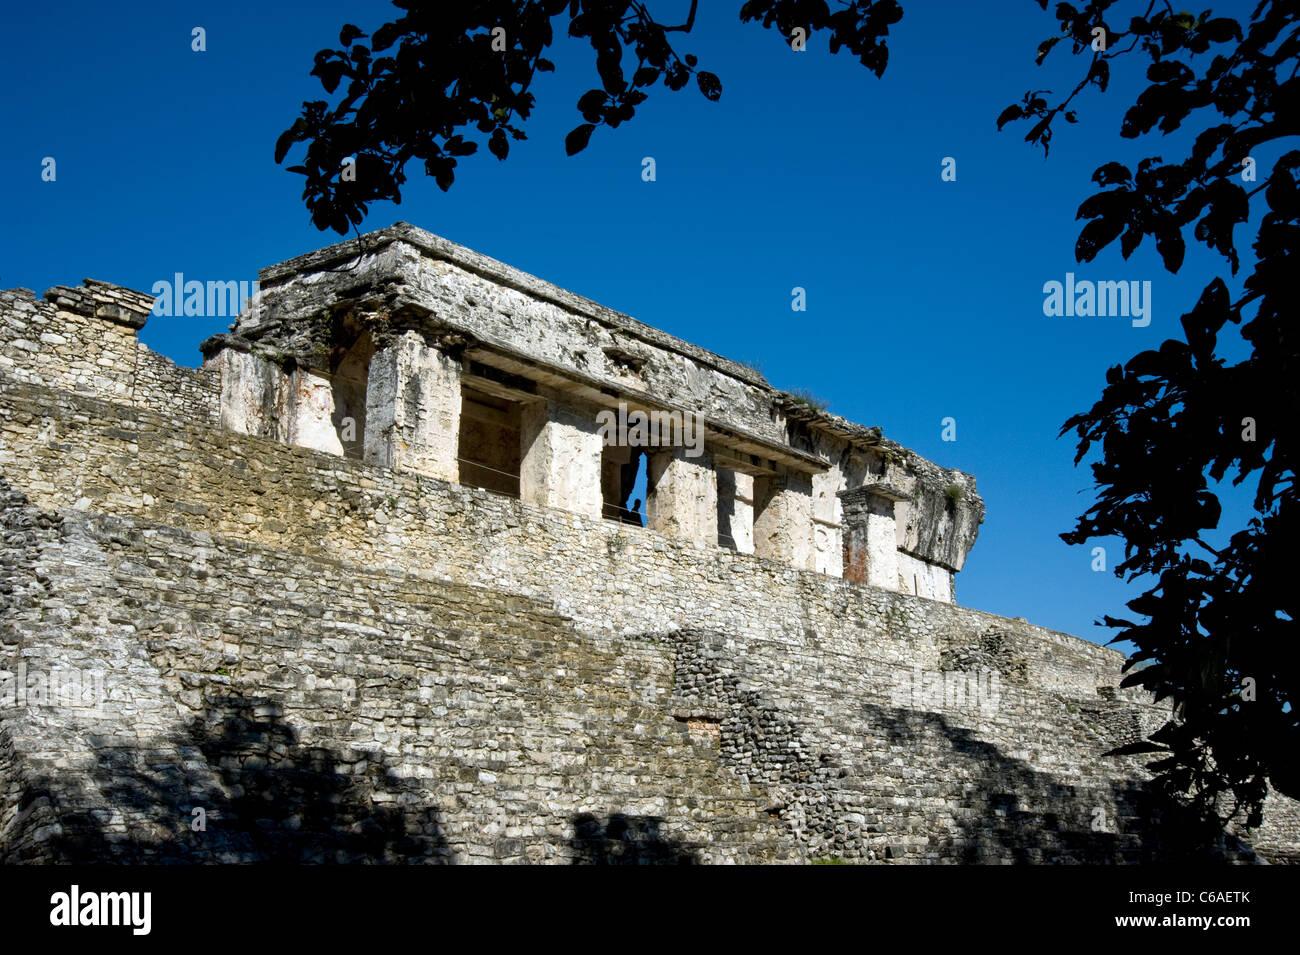 Mayan Ruins at Palenque in Mexico - Stock Image